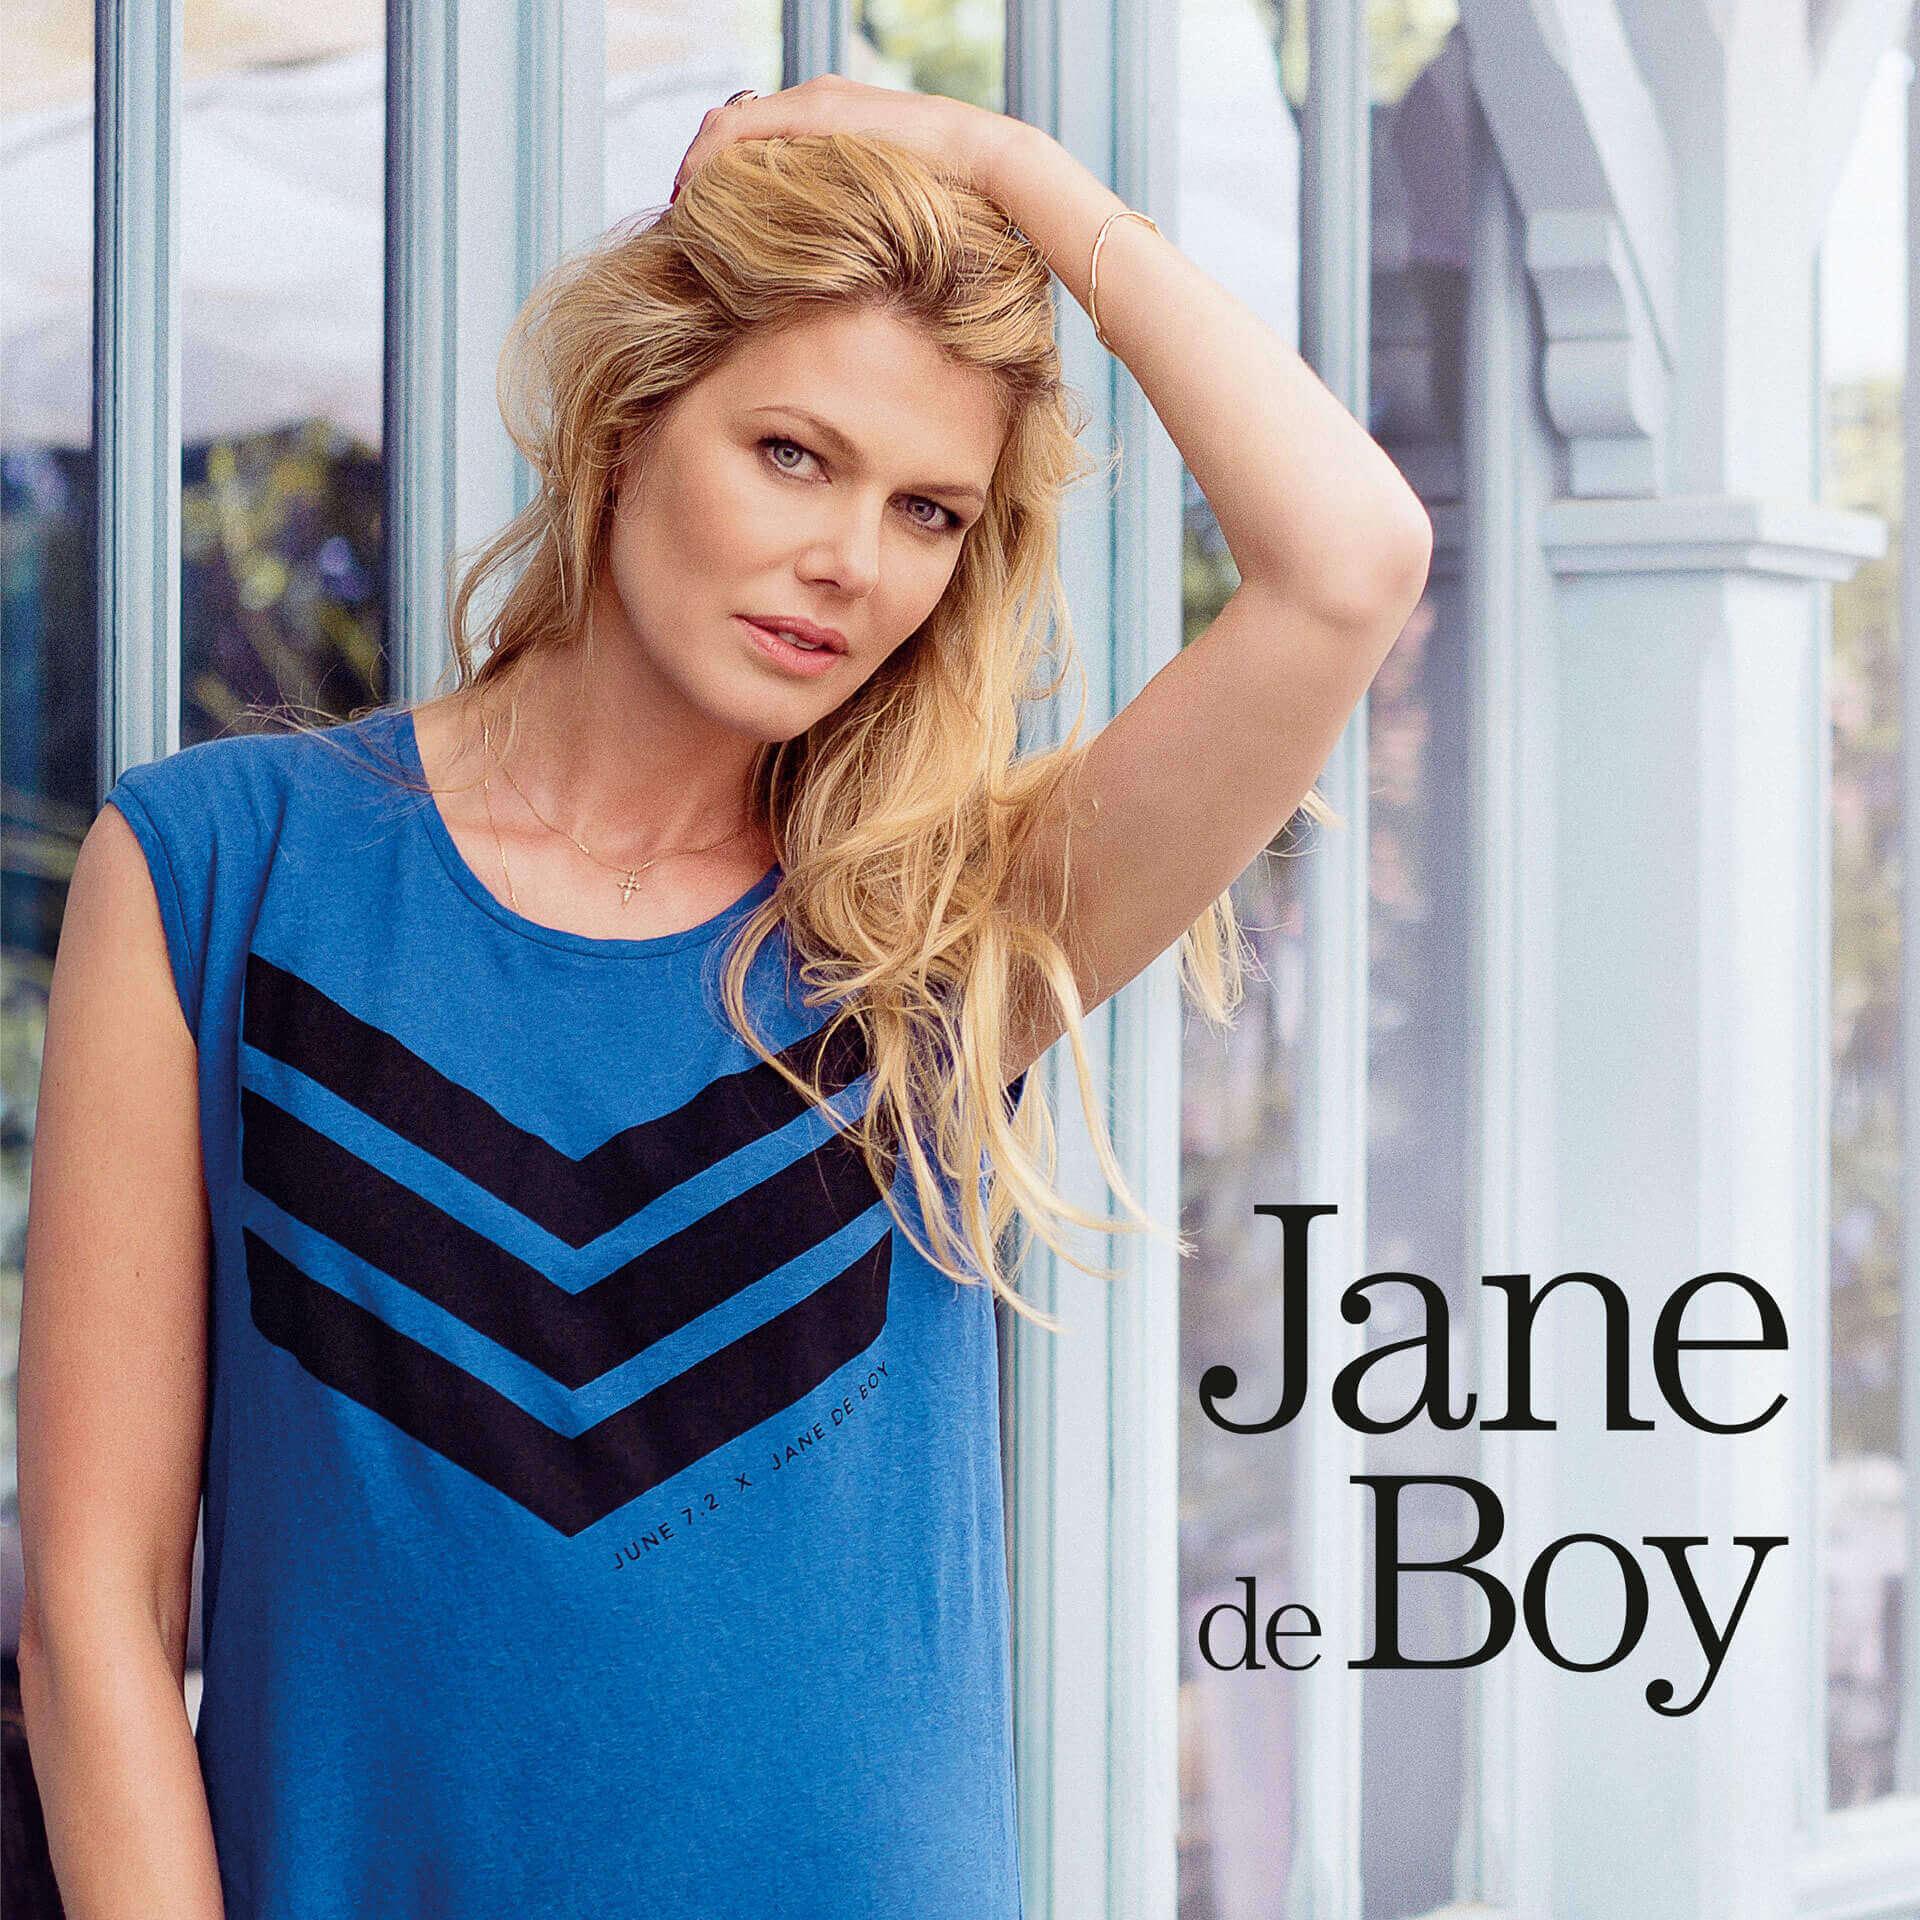 jane boy cover robe Ingrid Seynhaeve